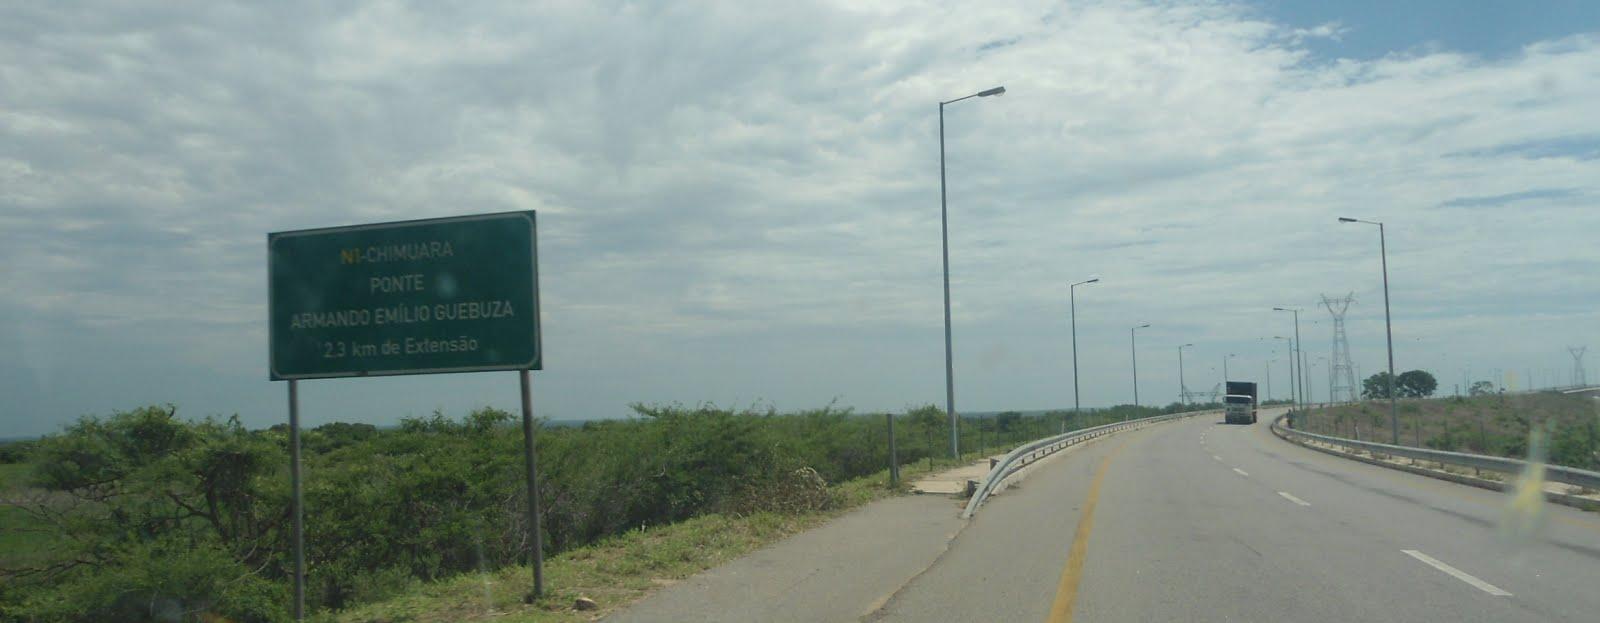 Chegando ao rio Zambeze!